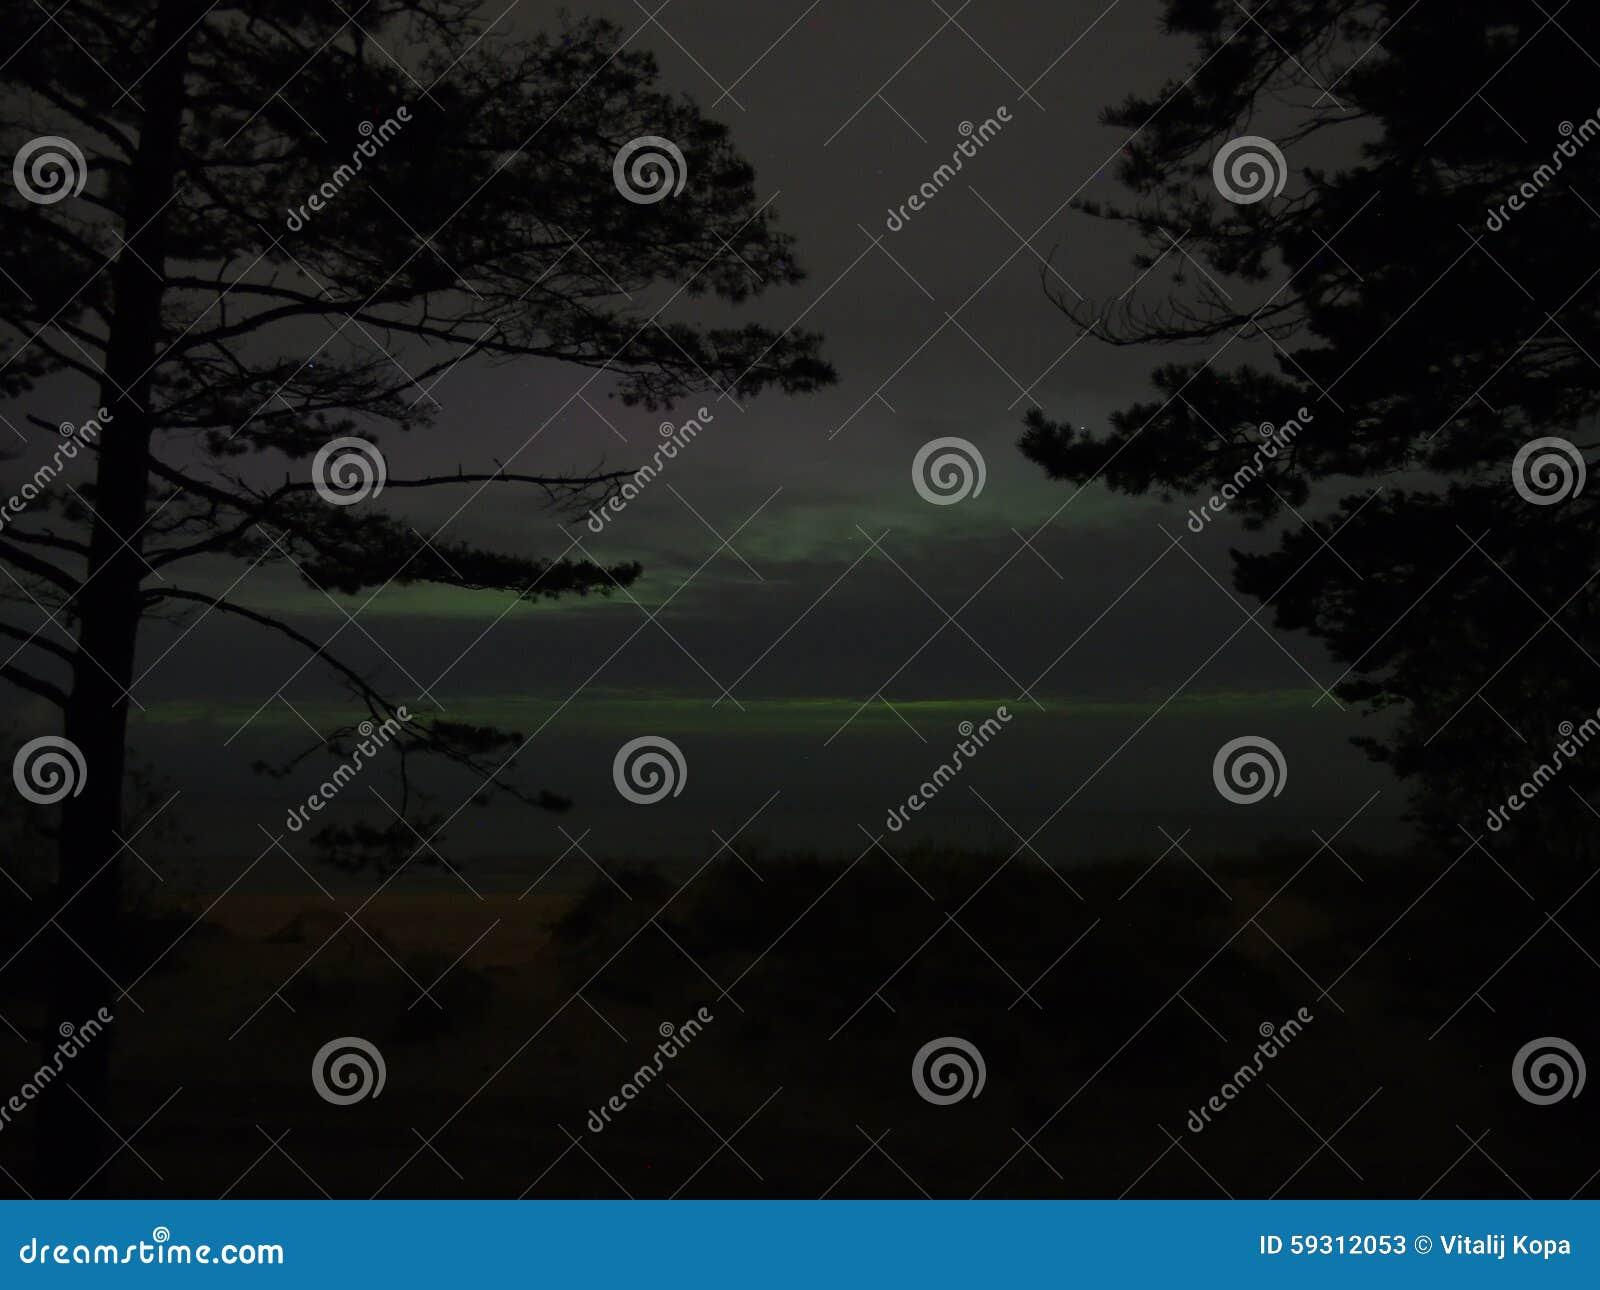 Aurora polar lights and clouds over sea